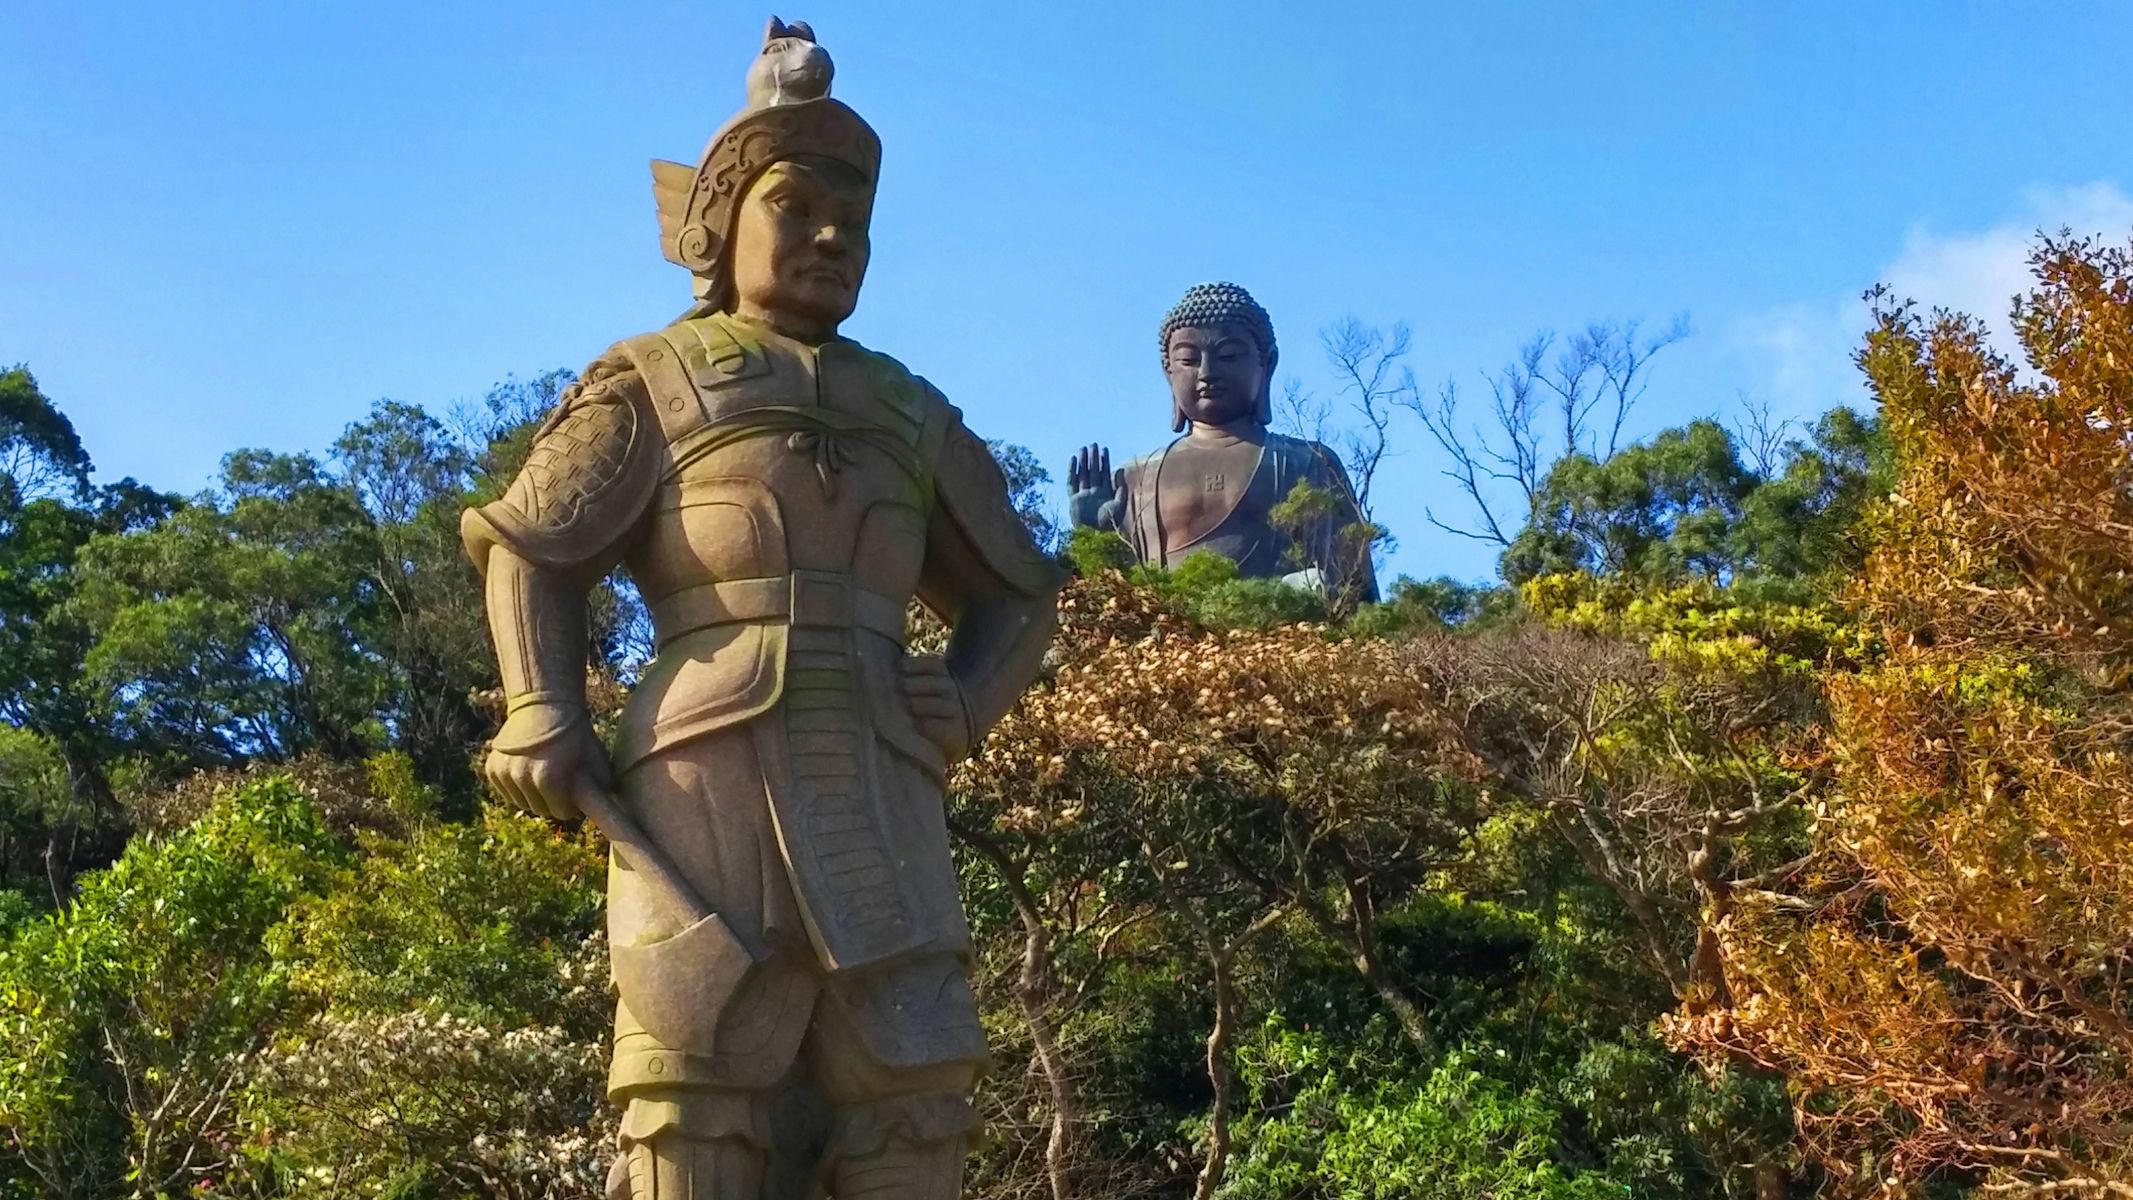 Divine General on Bodhi Road and Big Buddha